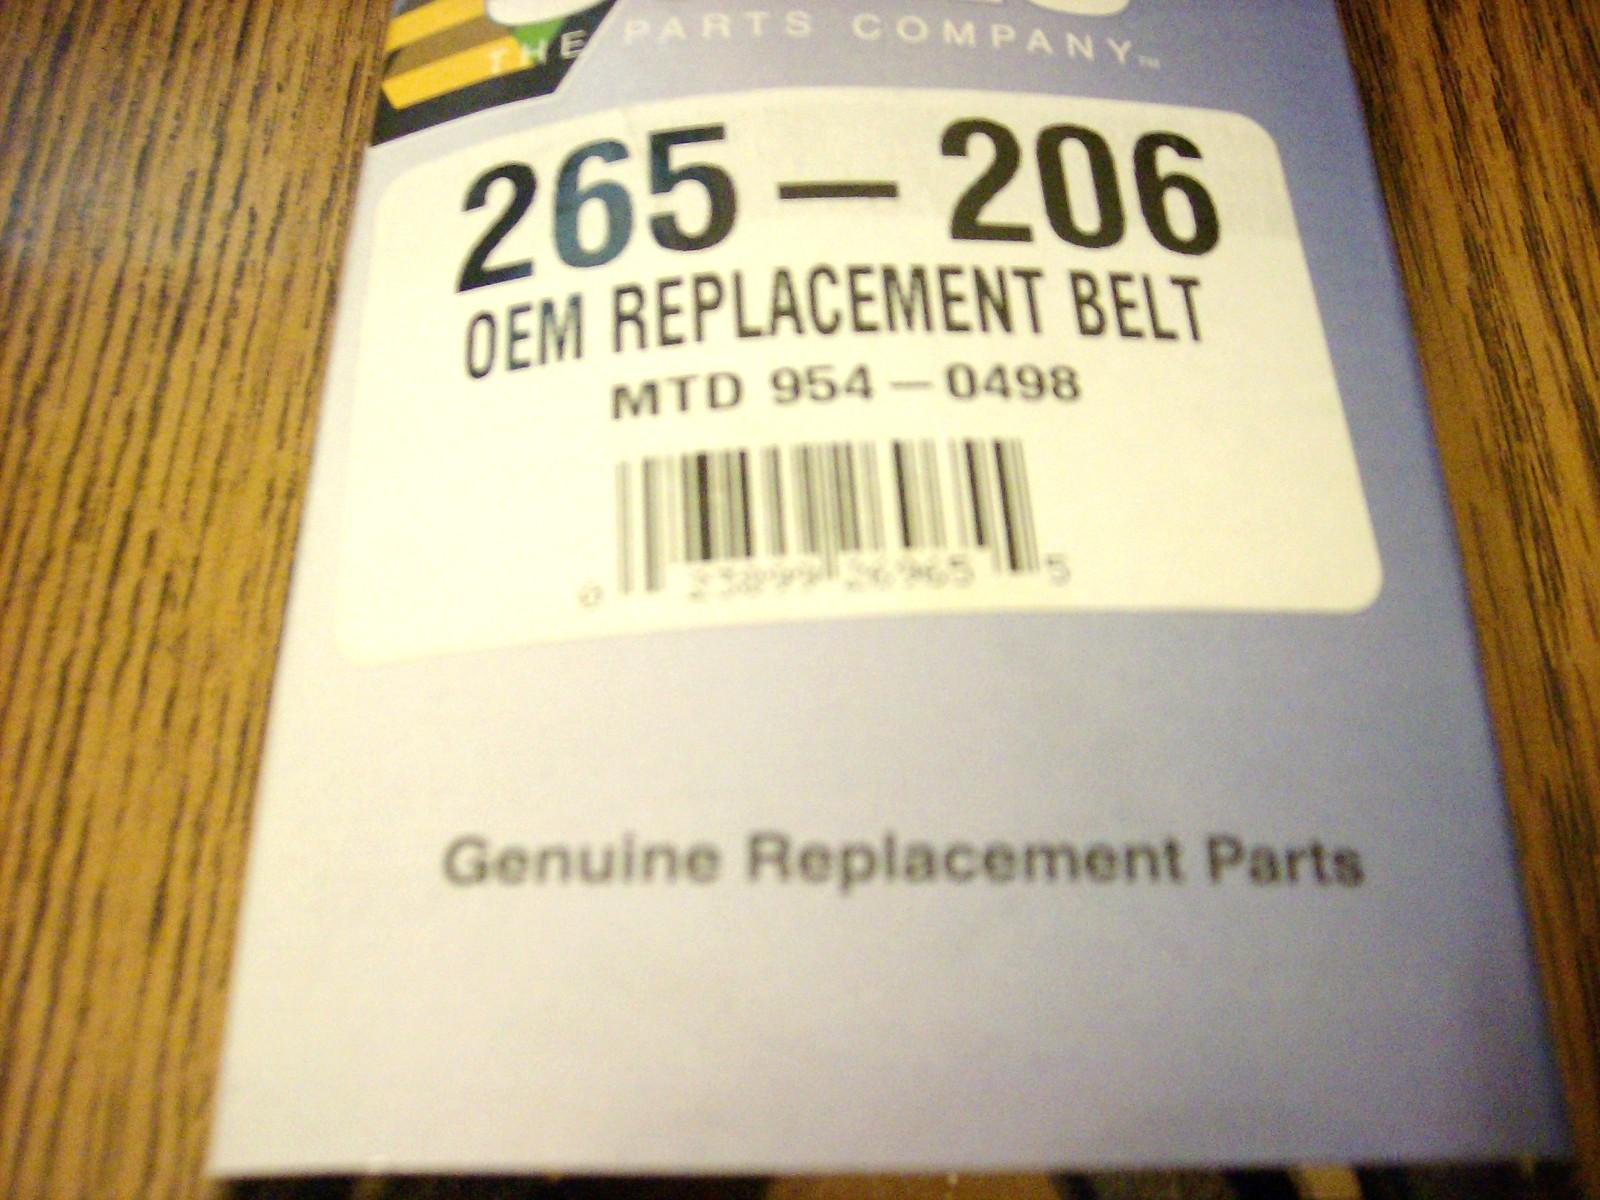 "MTD and Troy Bilt Deck Belt, 42"" Cut, 754-0498, 954-0498"